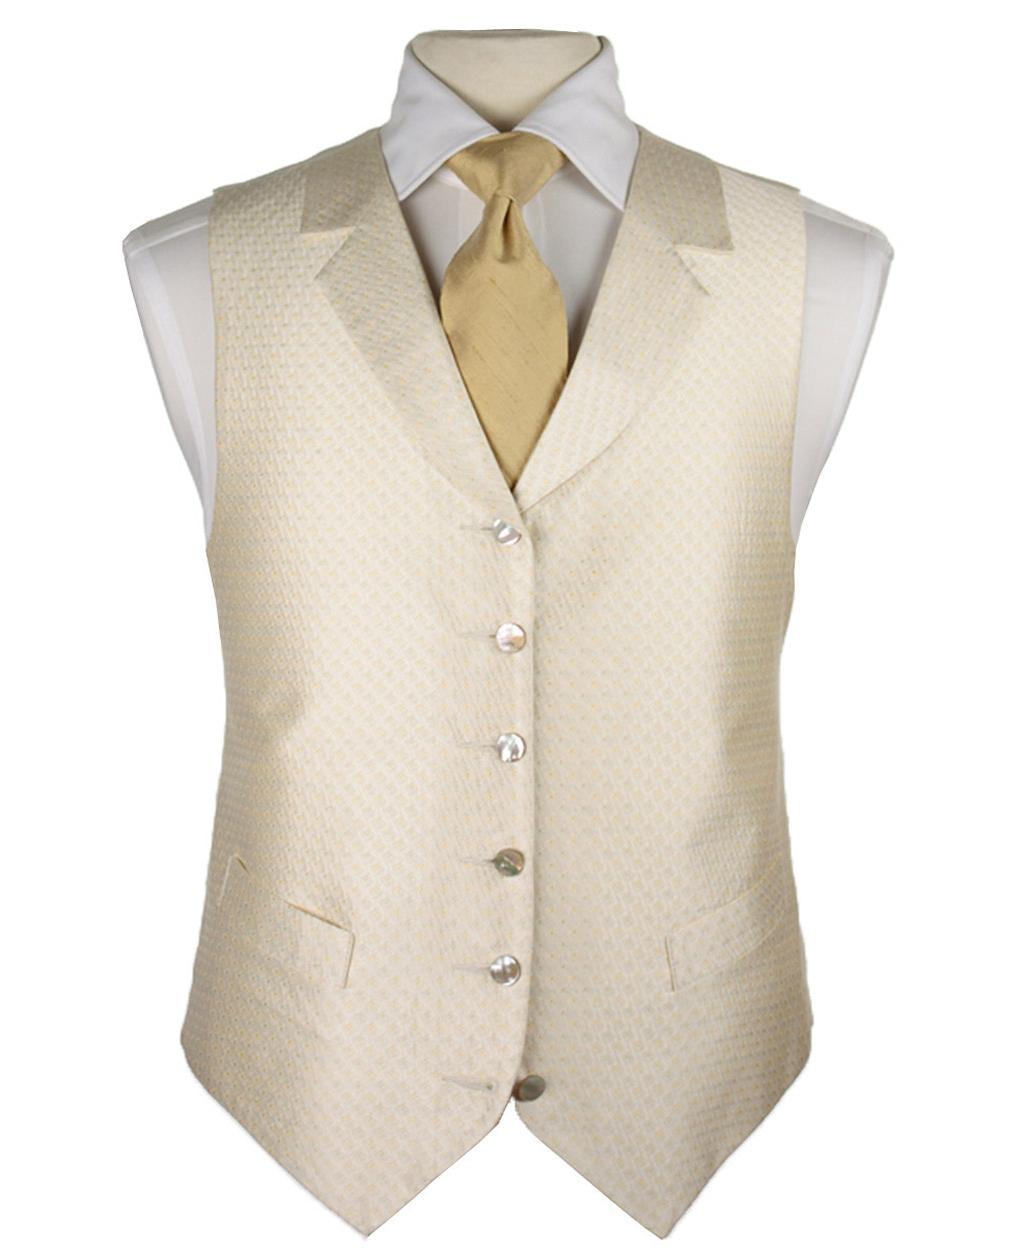 Wedding Suit Hire : Waistcoats